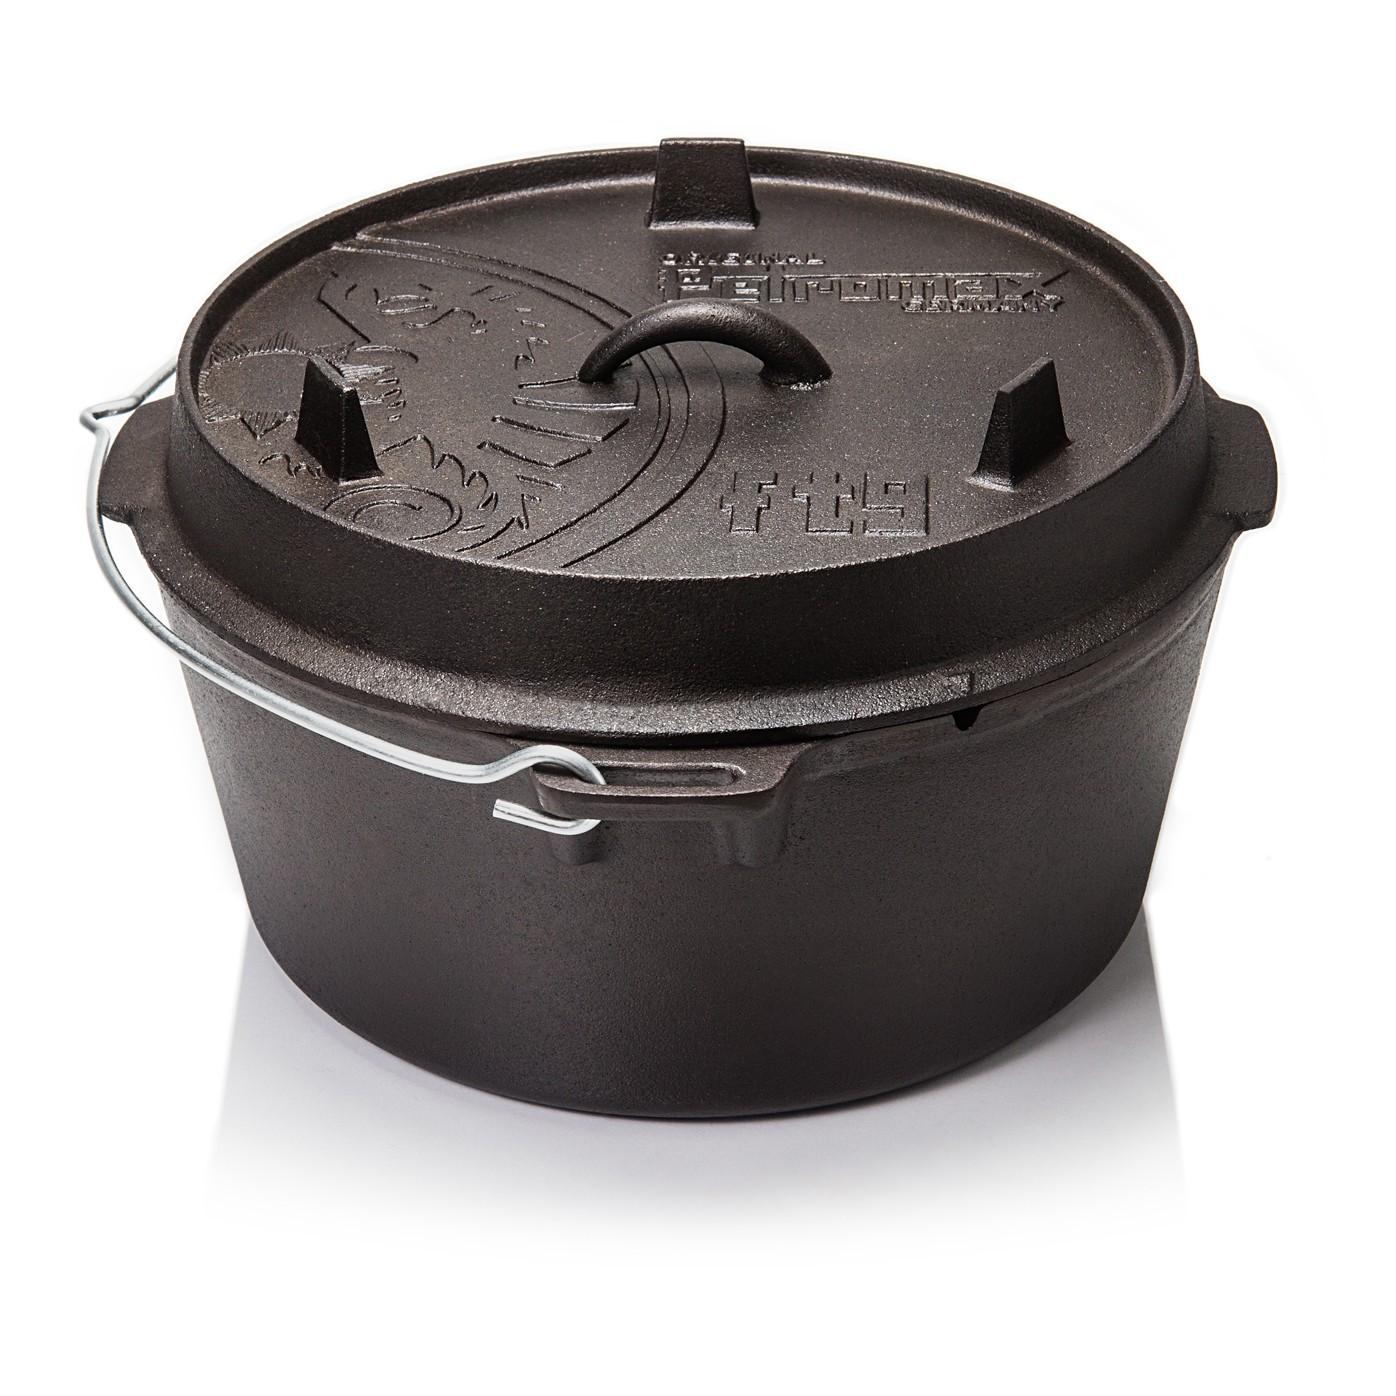 petromax ft9 t feuertopf 8 5 liter dutch oven ohne f e. Black Bedroom Furniture Sets. Home Design Ideas